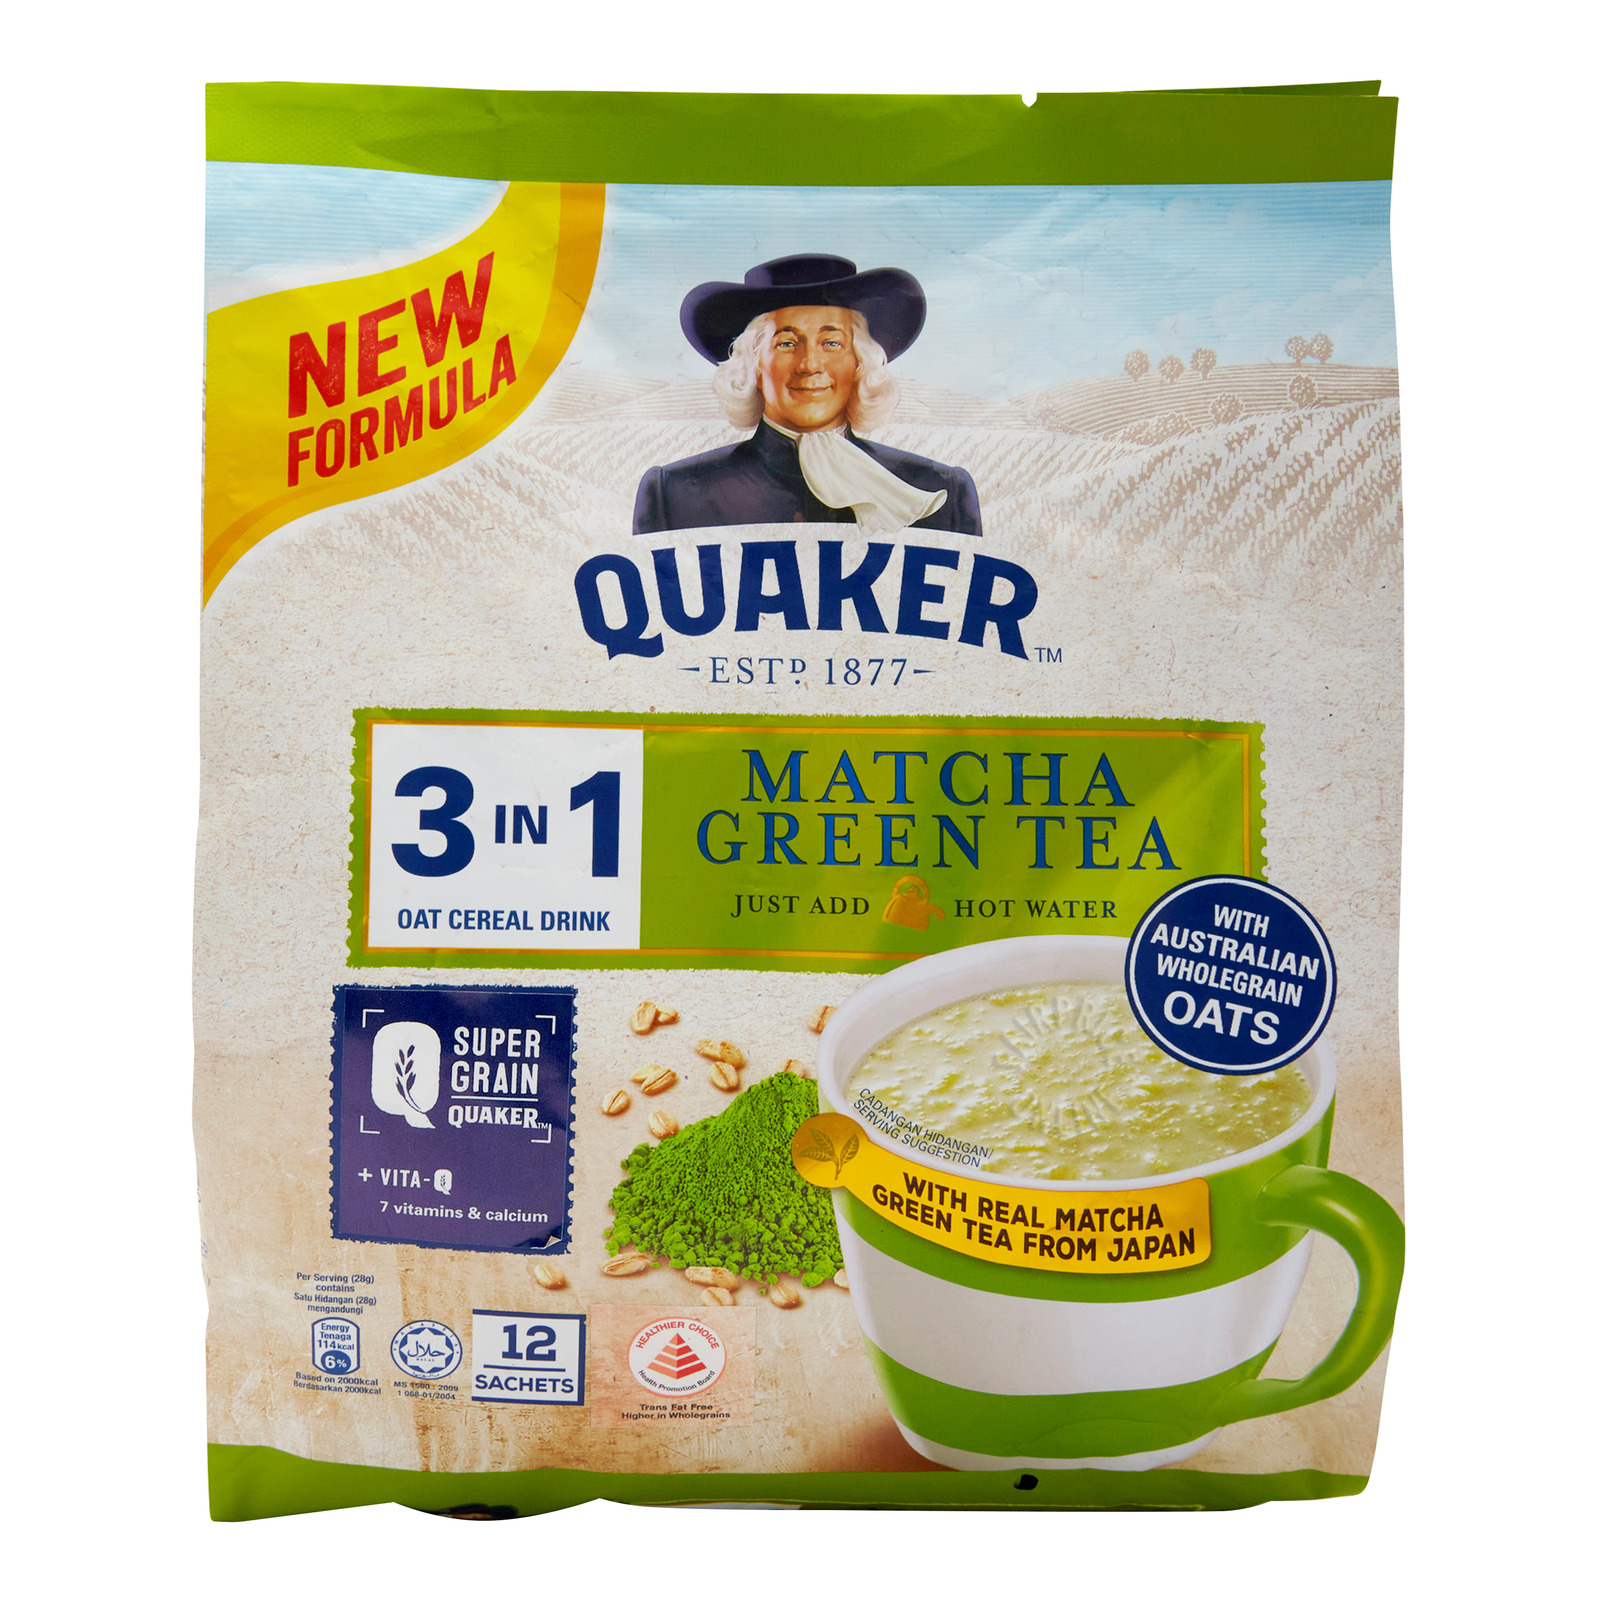 Quaker 3 in 1 Oat Cereal Drink - Matcha Green Tea